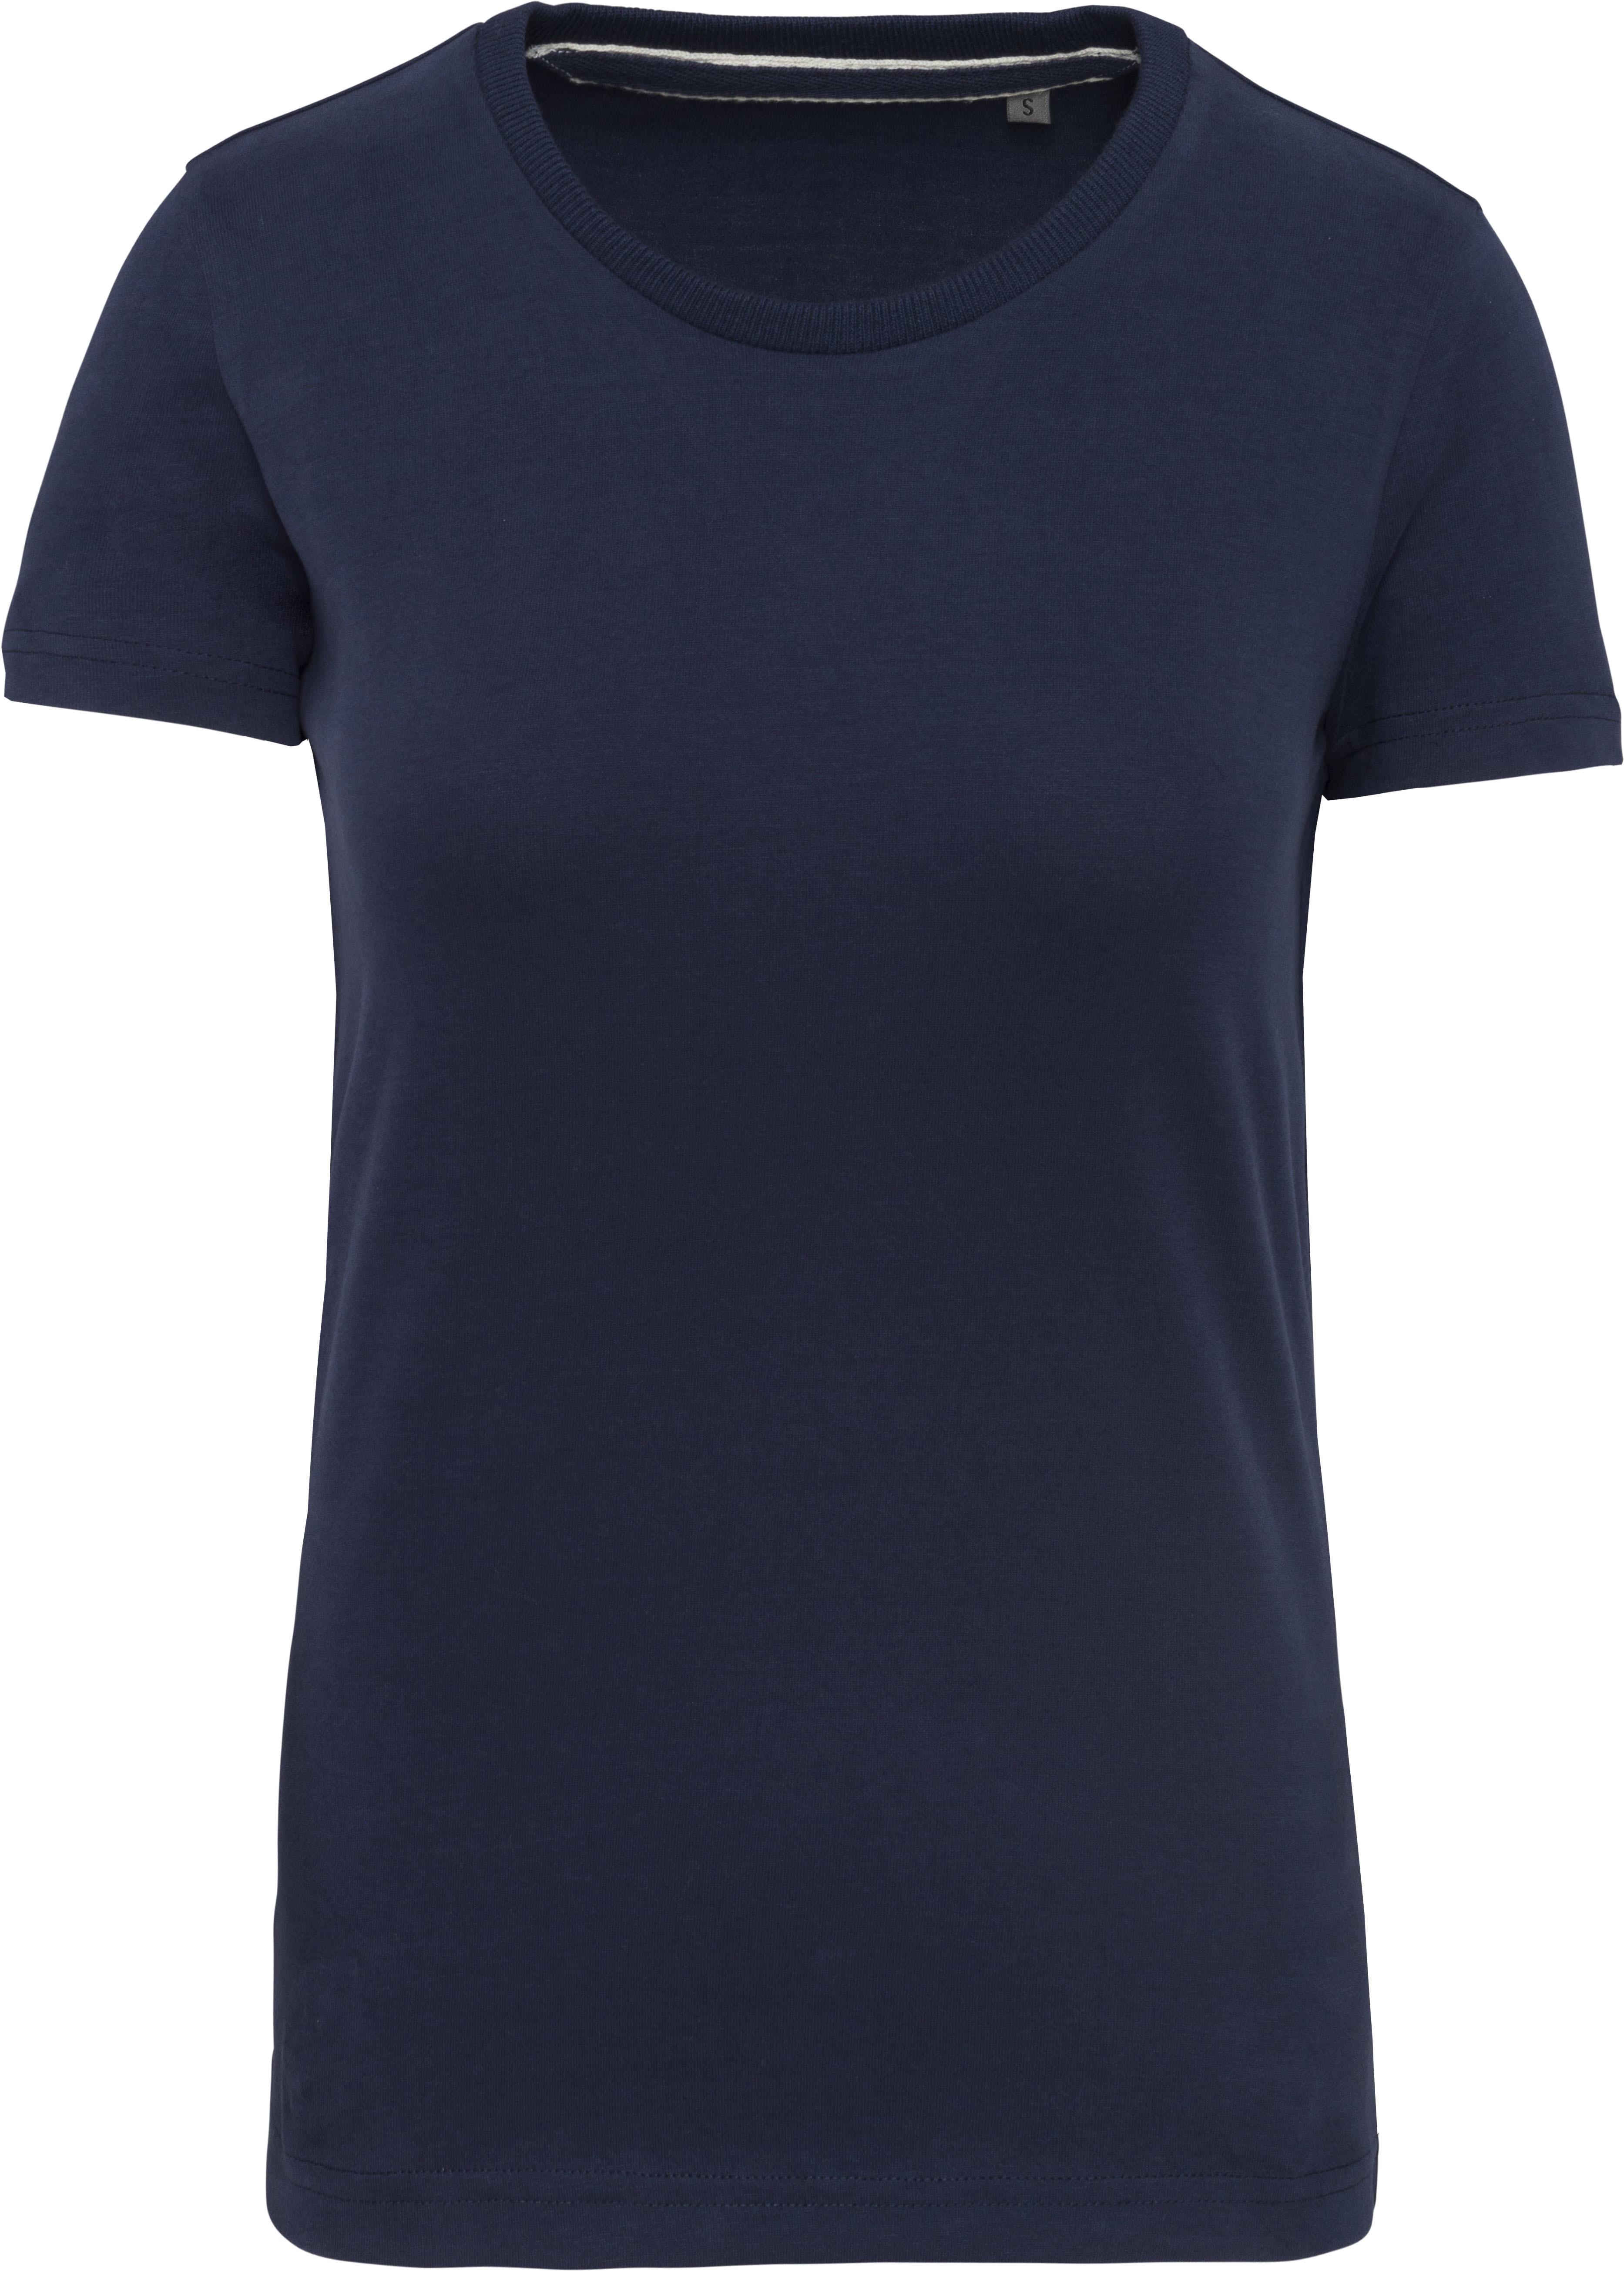 Tee-shirt vintage manches courtes femme - 2-1527-13